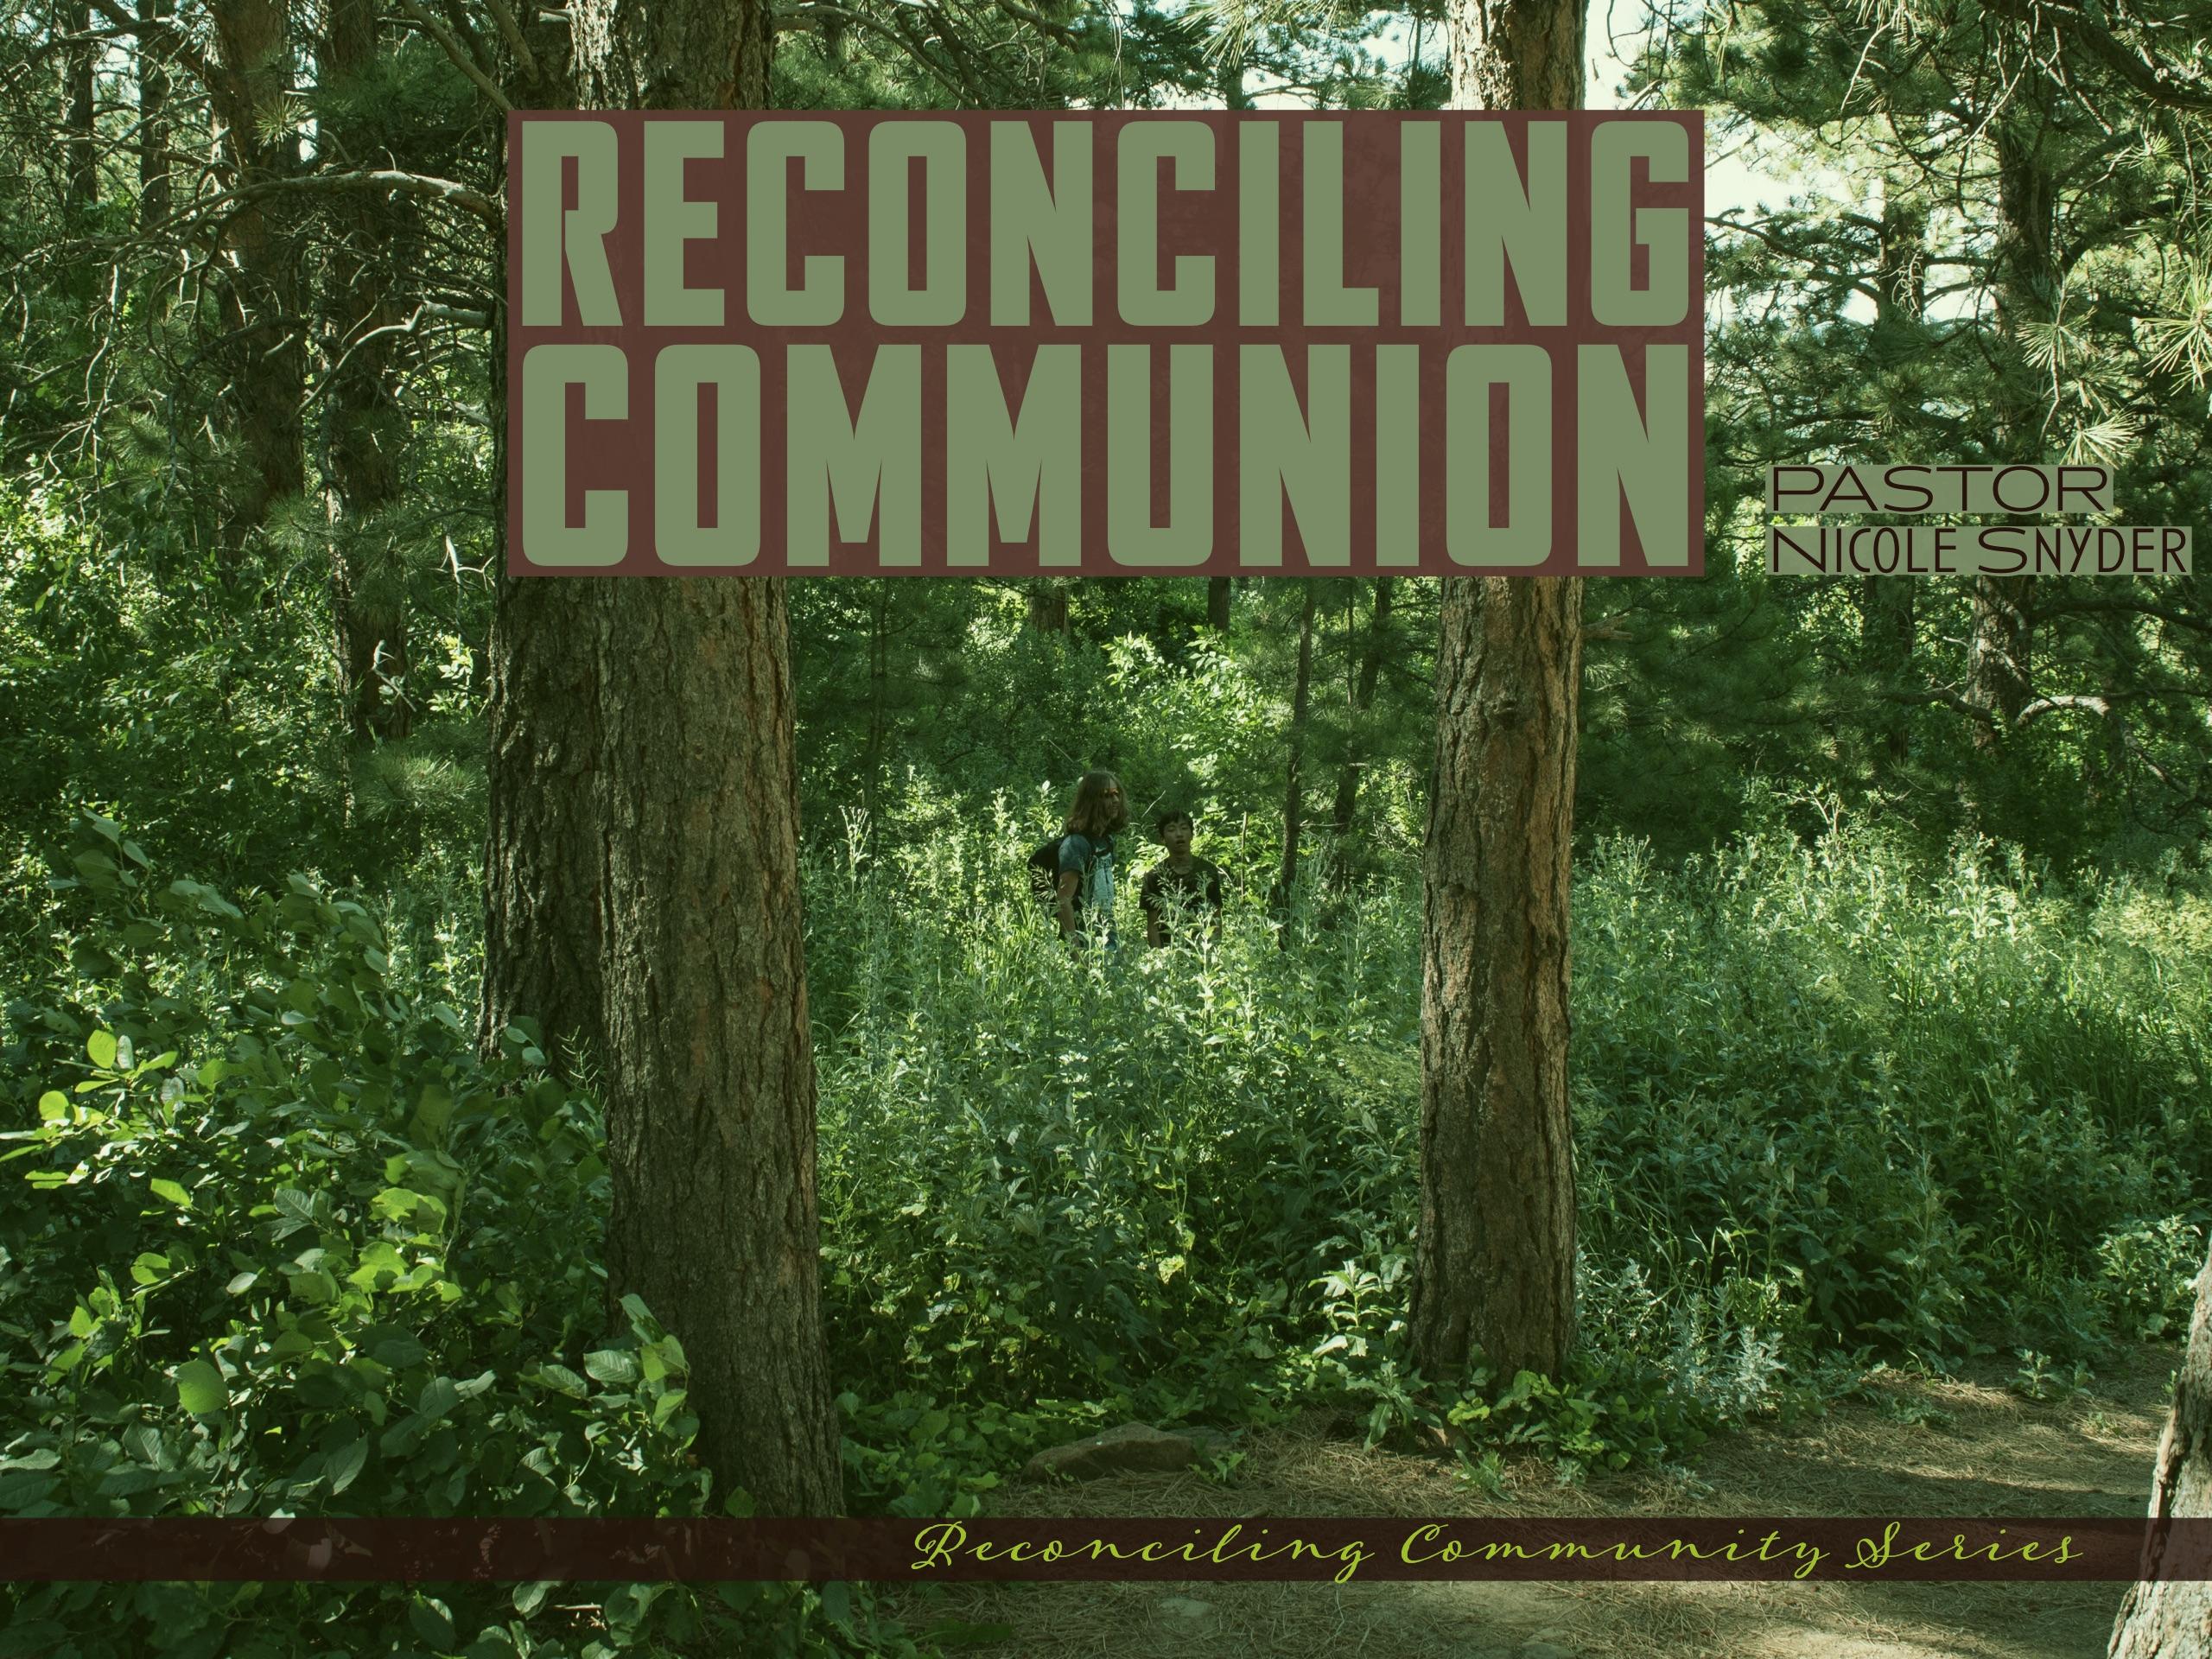 Reconciling Communion